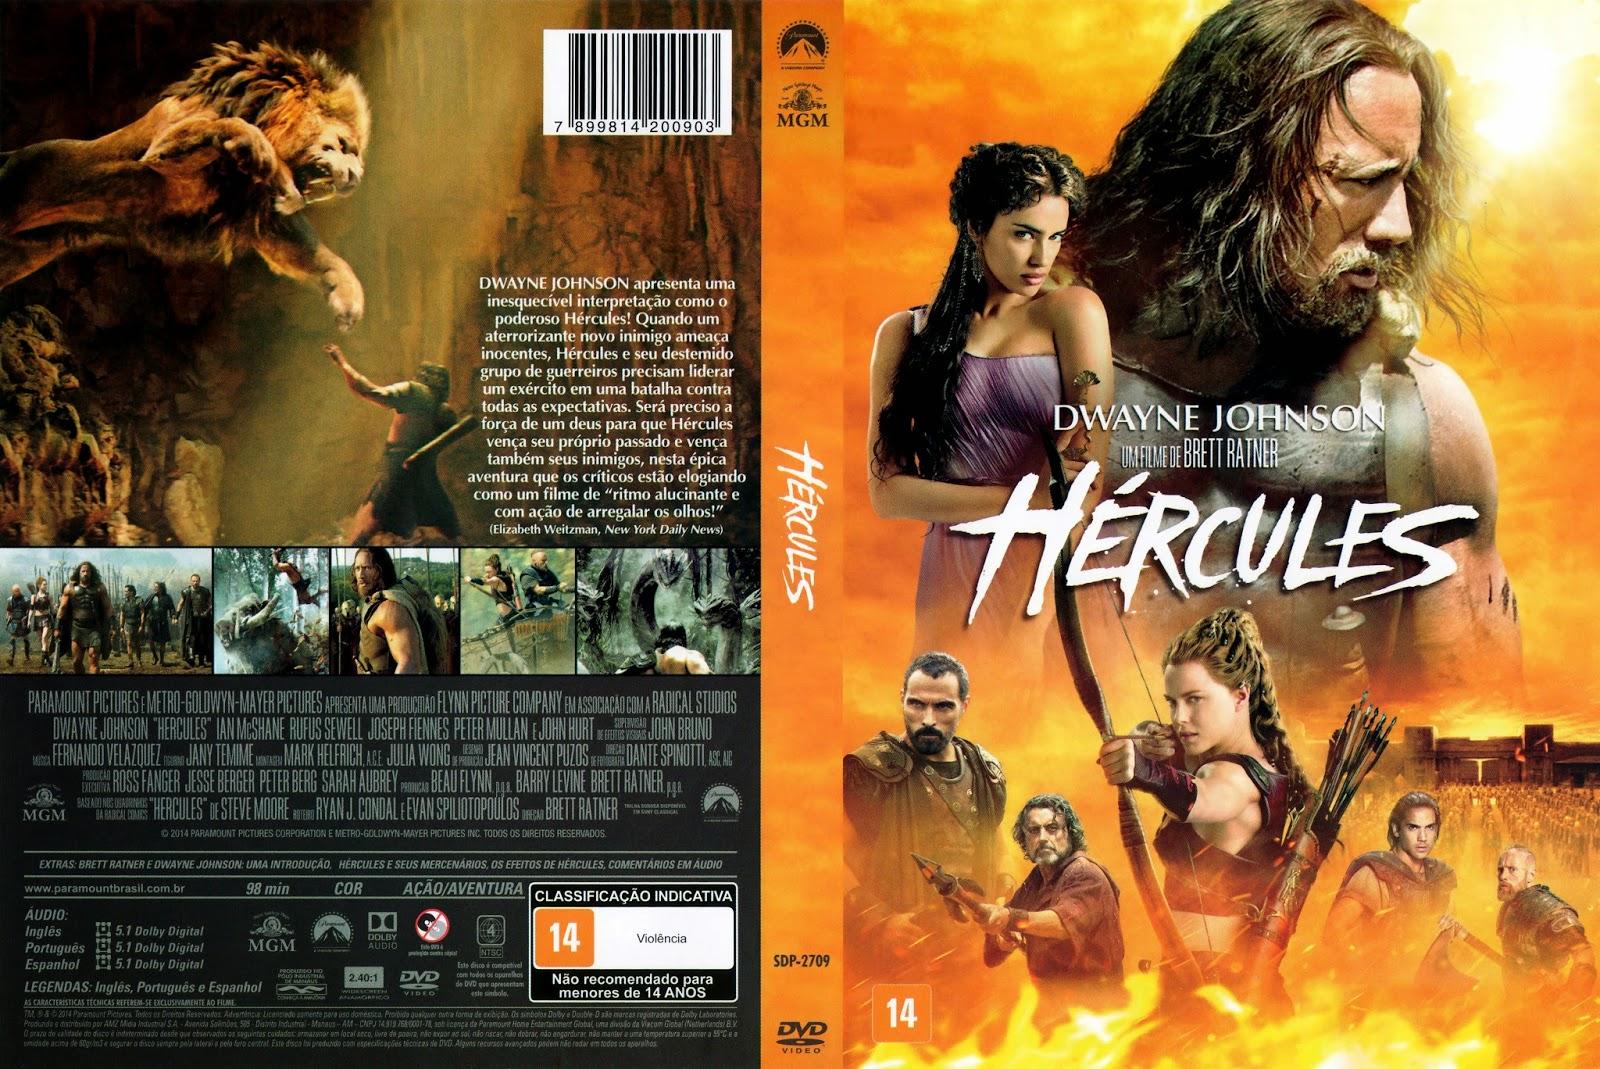 hercules oficial: